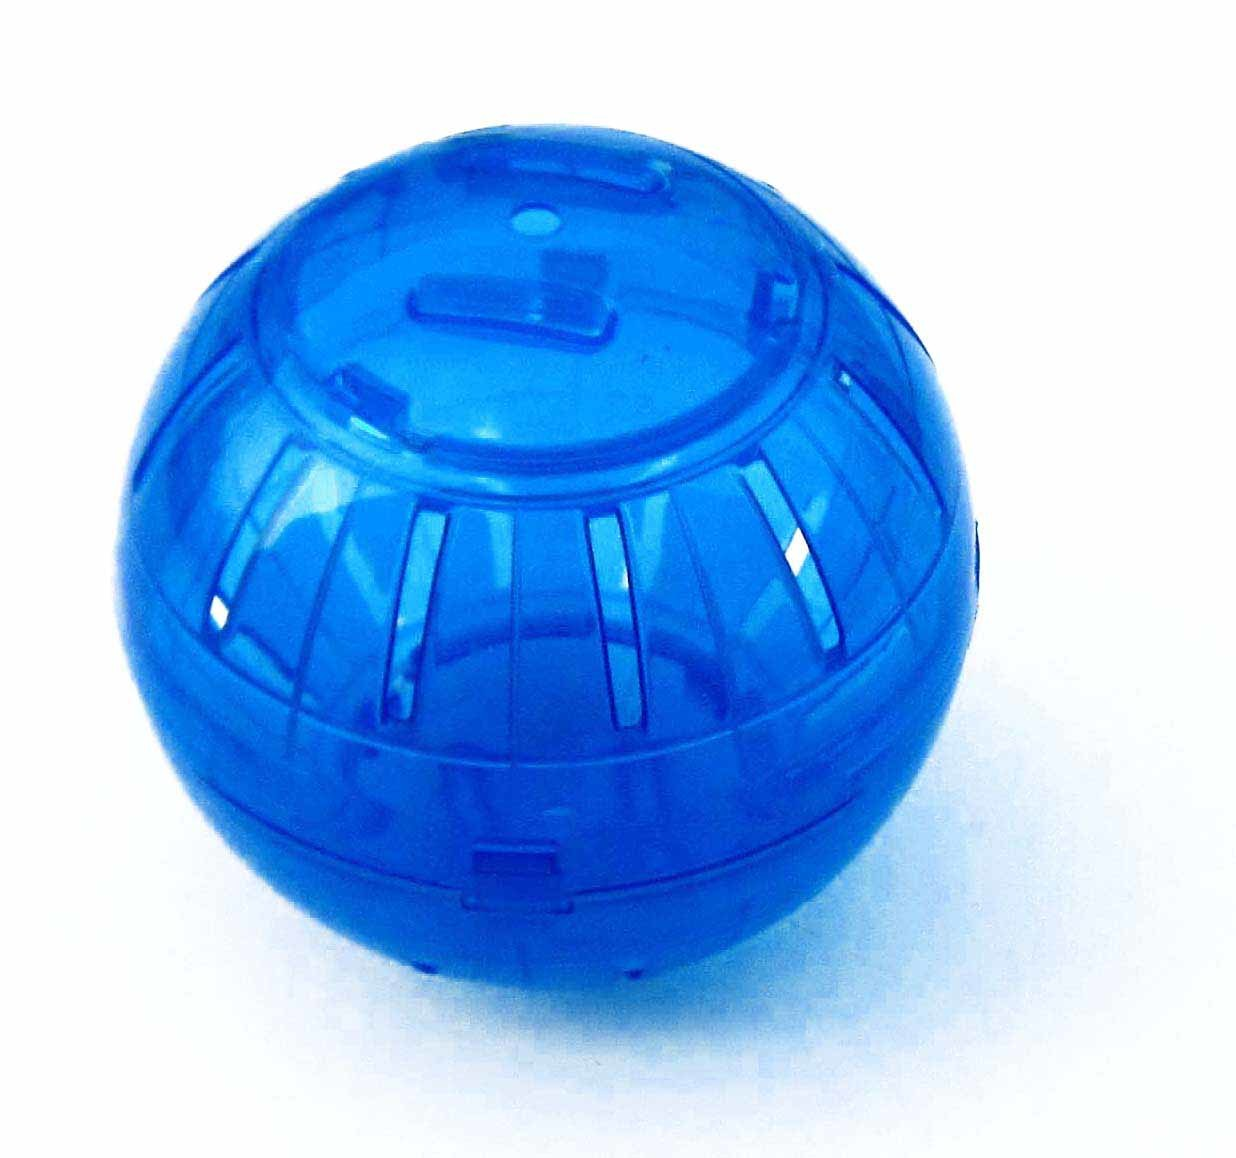 Hamster Ball Code 74